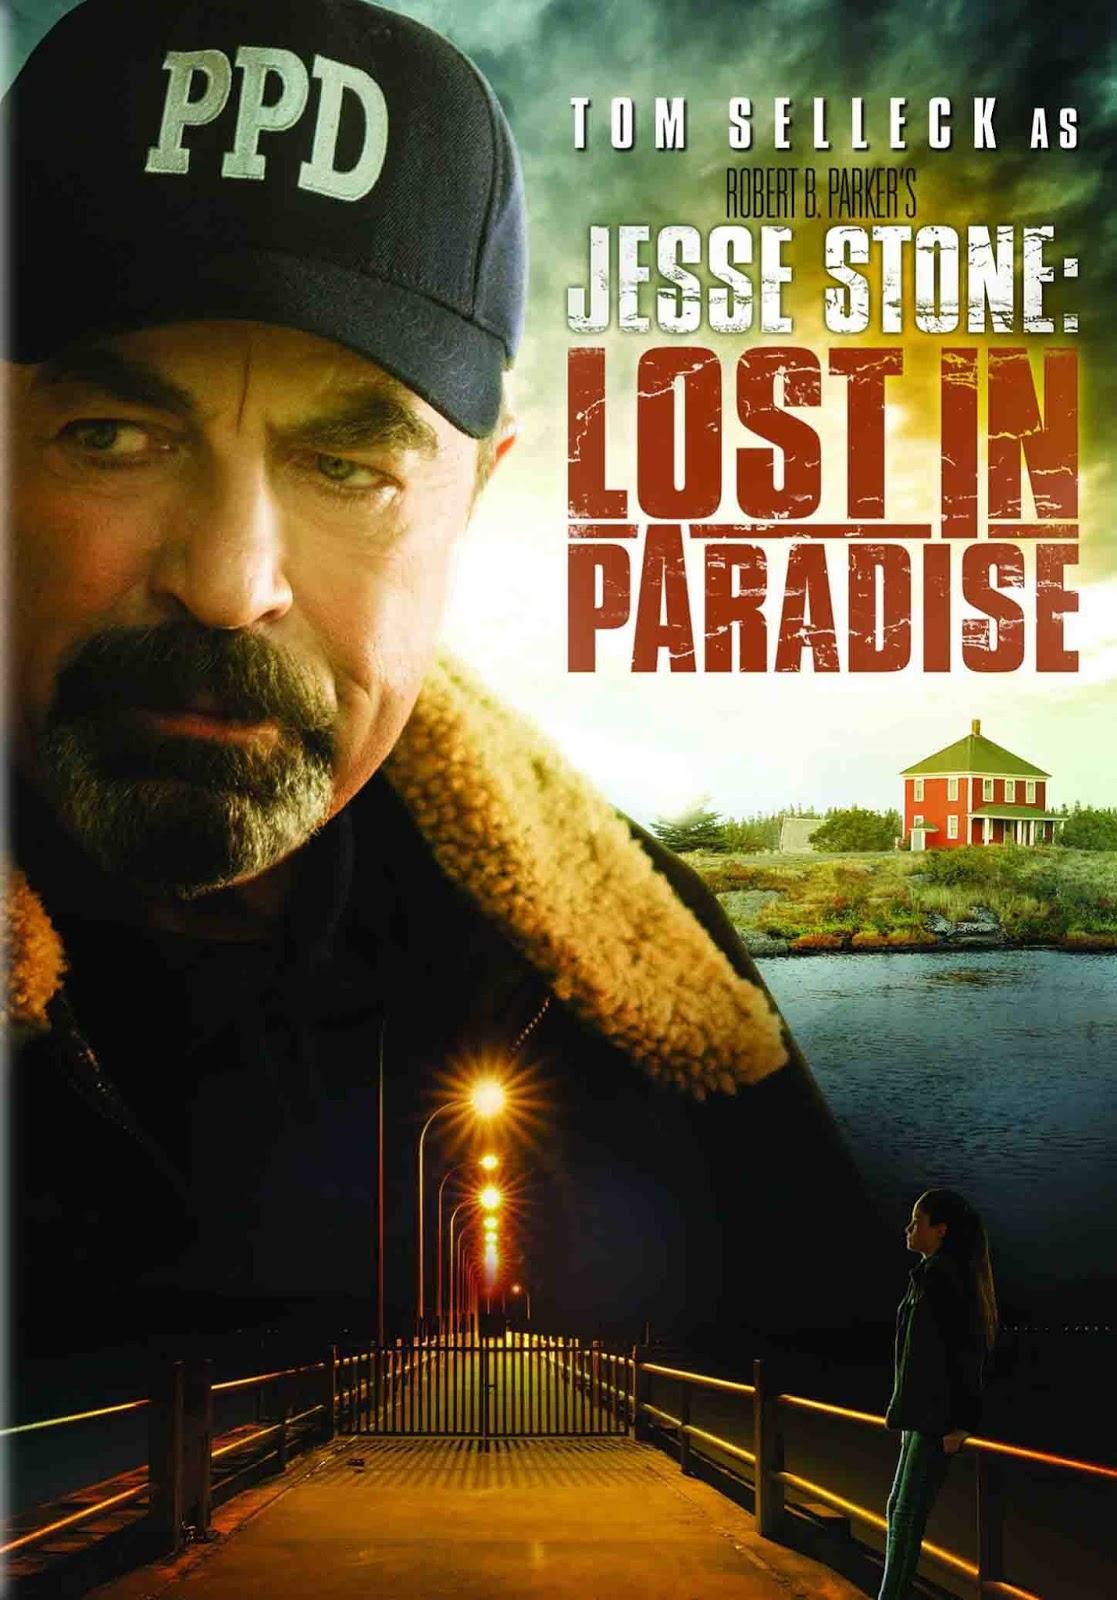 Baixar Filme Jesse Stone: Perdido no Paraíso (Dual Audio)